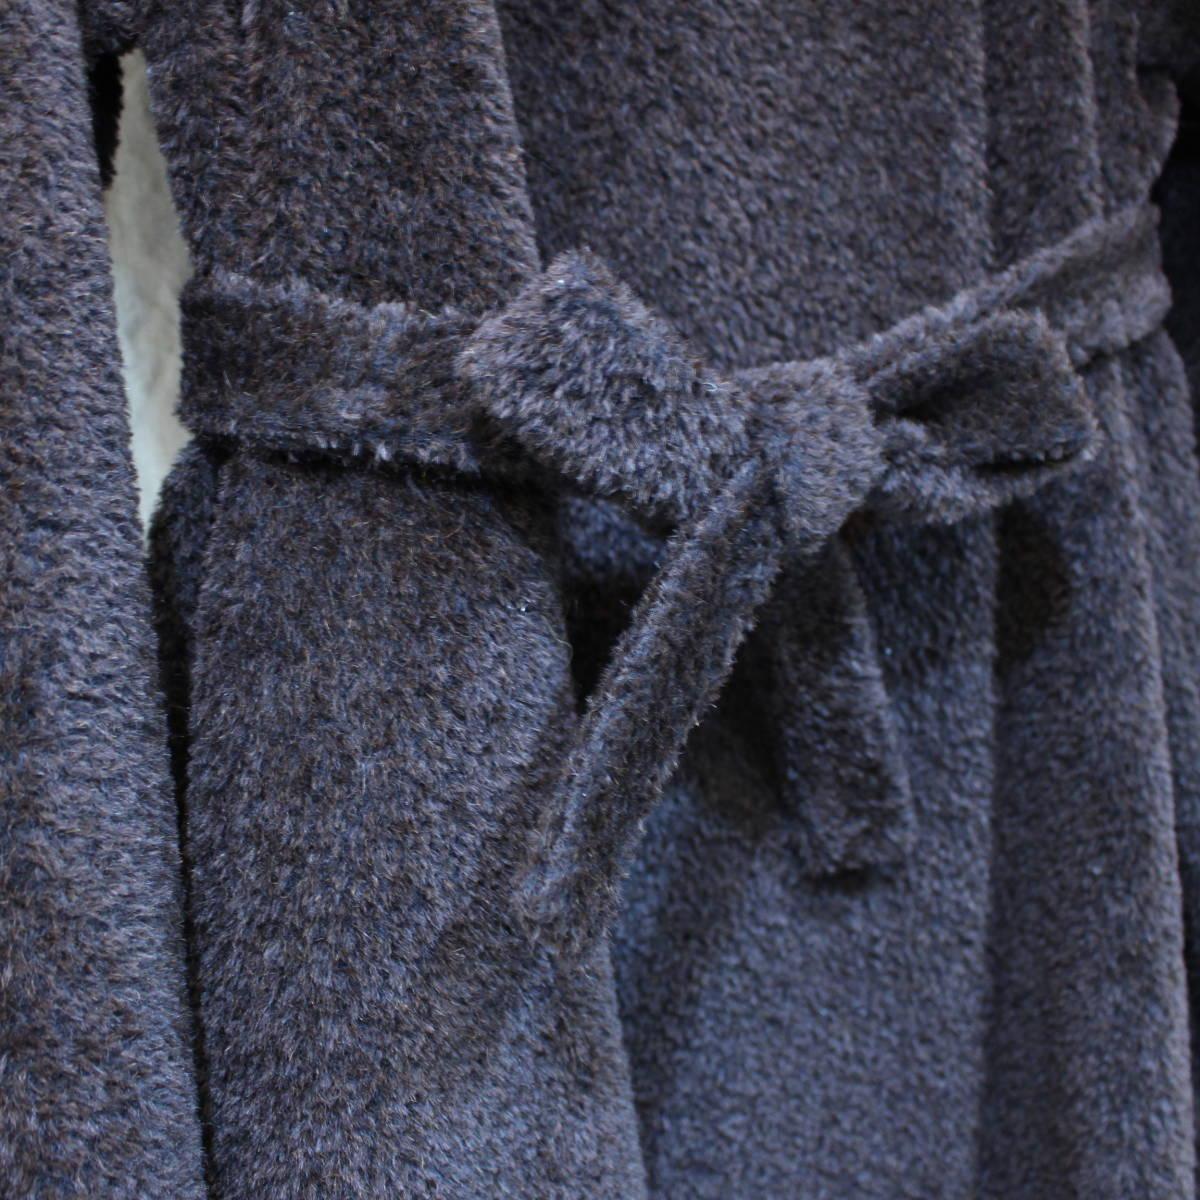 MAX MARA WHITE TAG ALPACA BREND BELTED OVER COAT MADE IN ITALY/マックスマーラ白タグアルパカ混ウールベルテッドオーバーコート_画像4